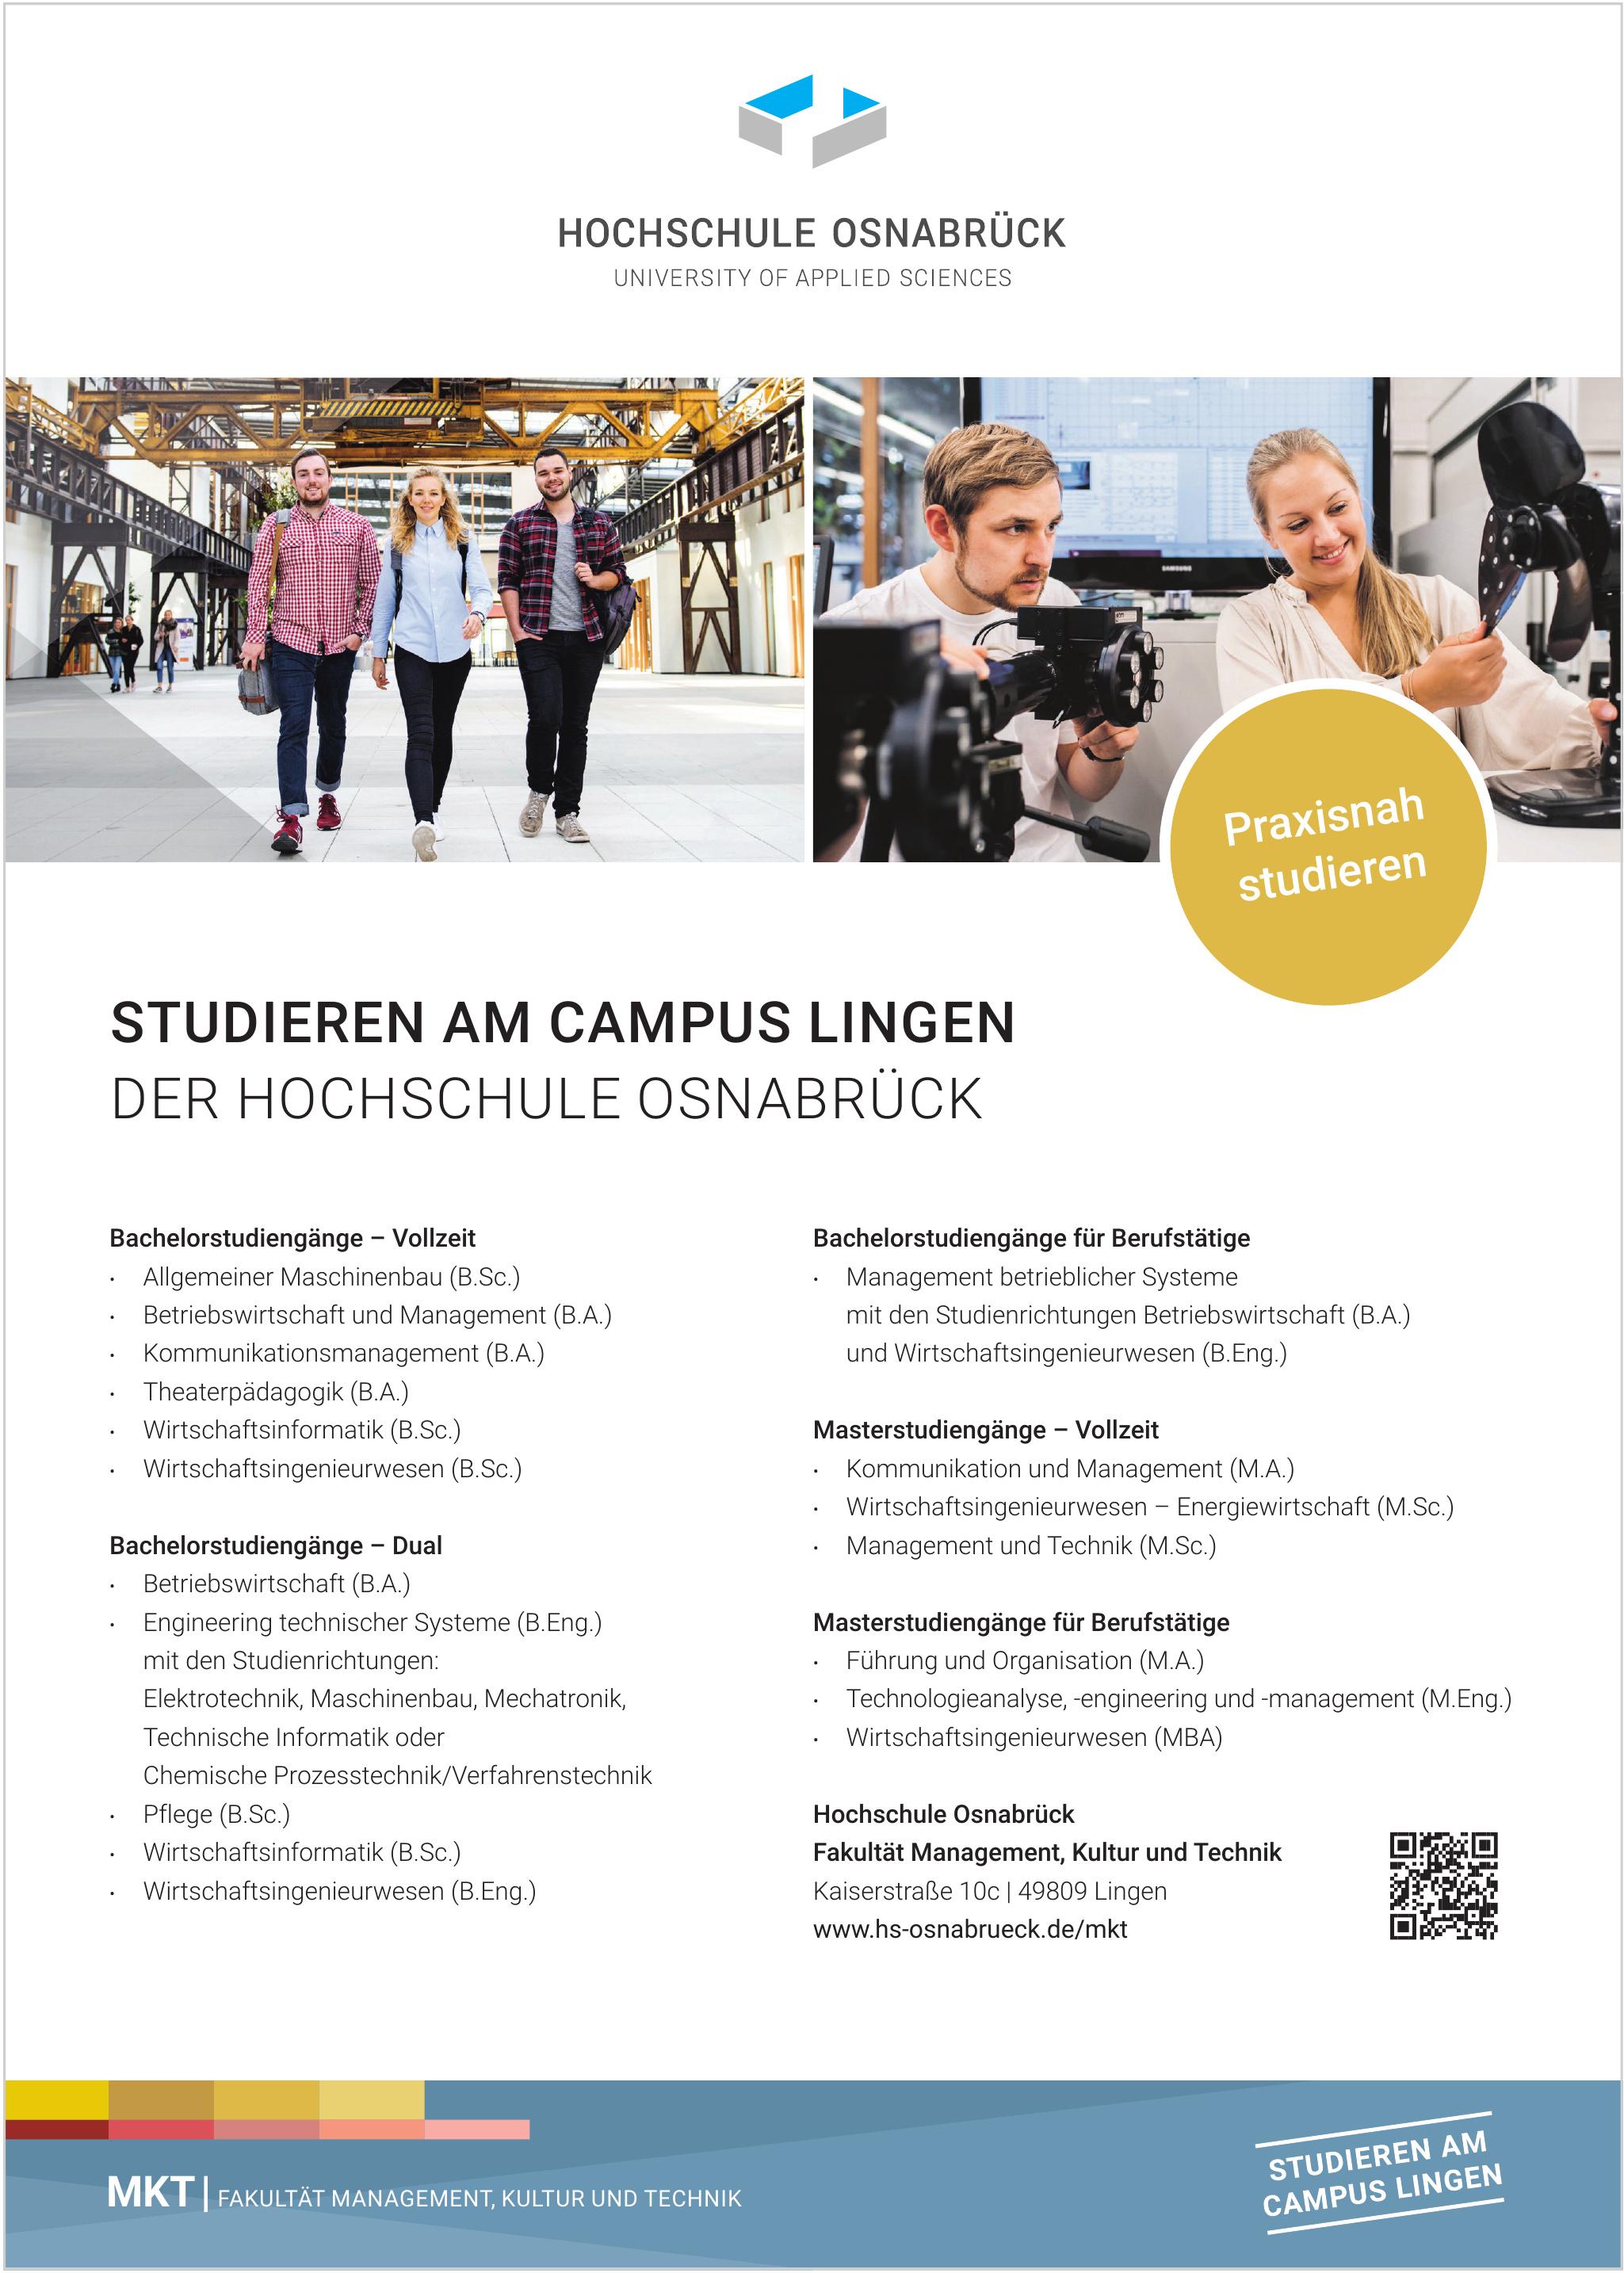 Hochschule Osnabrück - Fakultät Management, Kultur und Technik